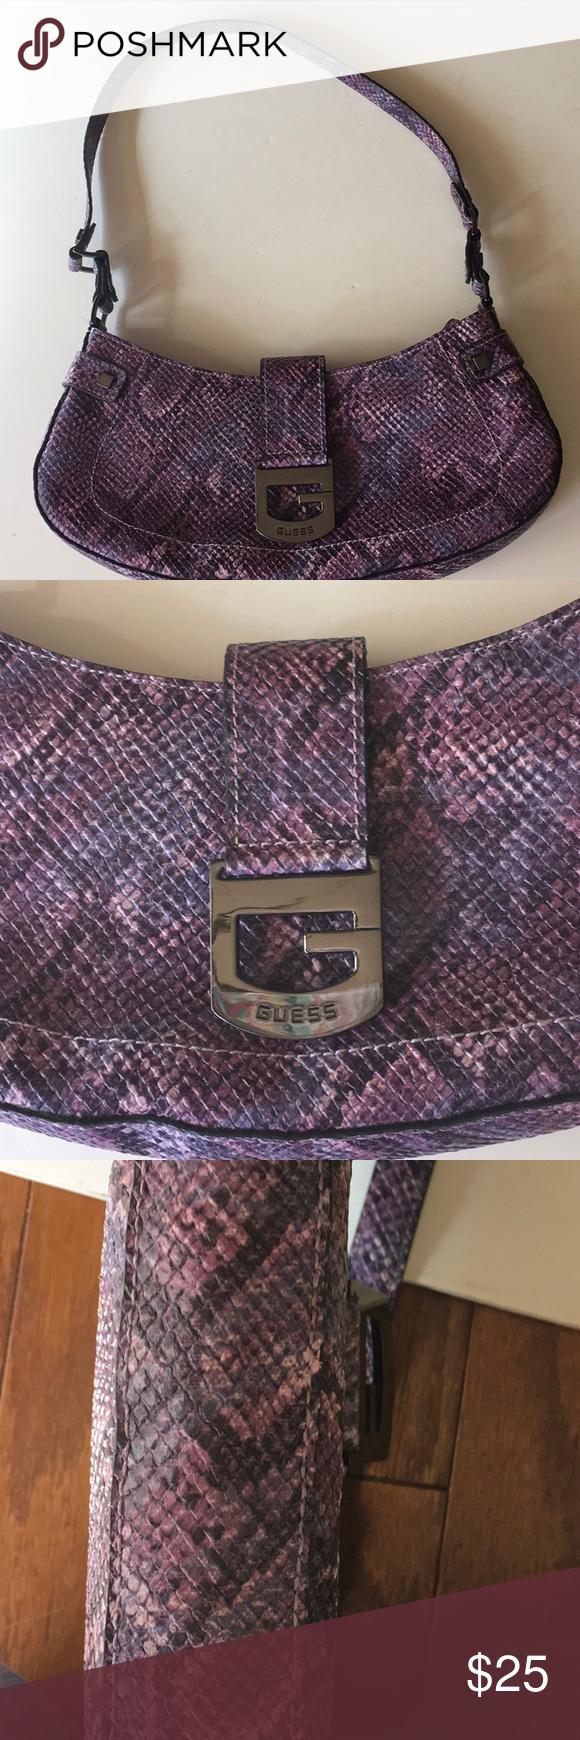 78bb24c9d4fca GUESS handbag Brand new..Guess purple faux alligator bag